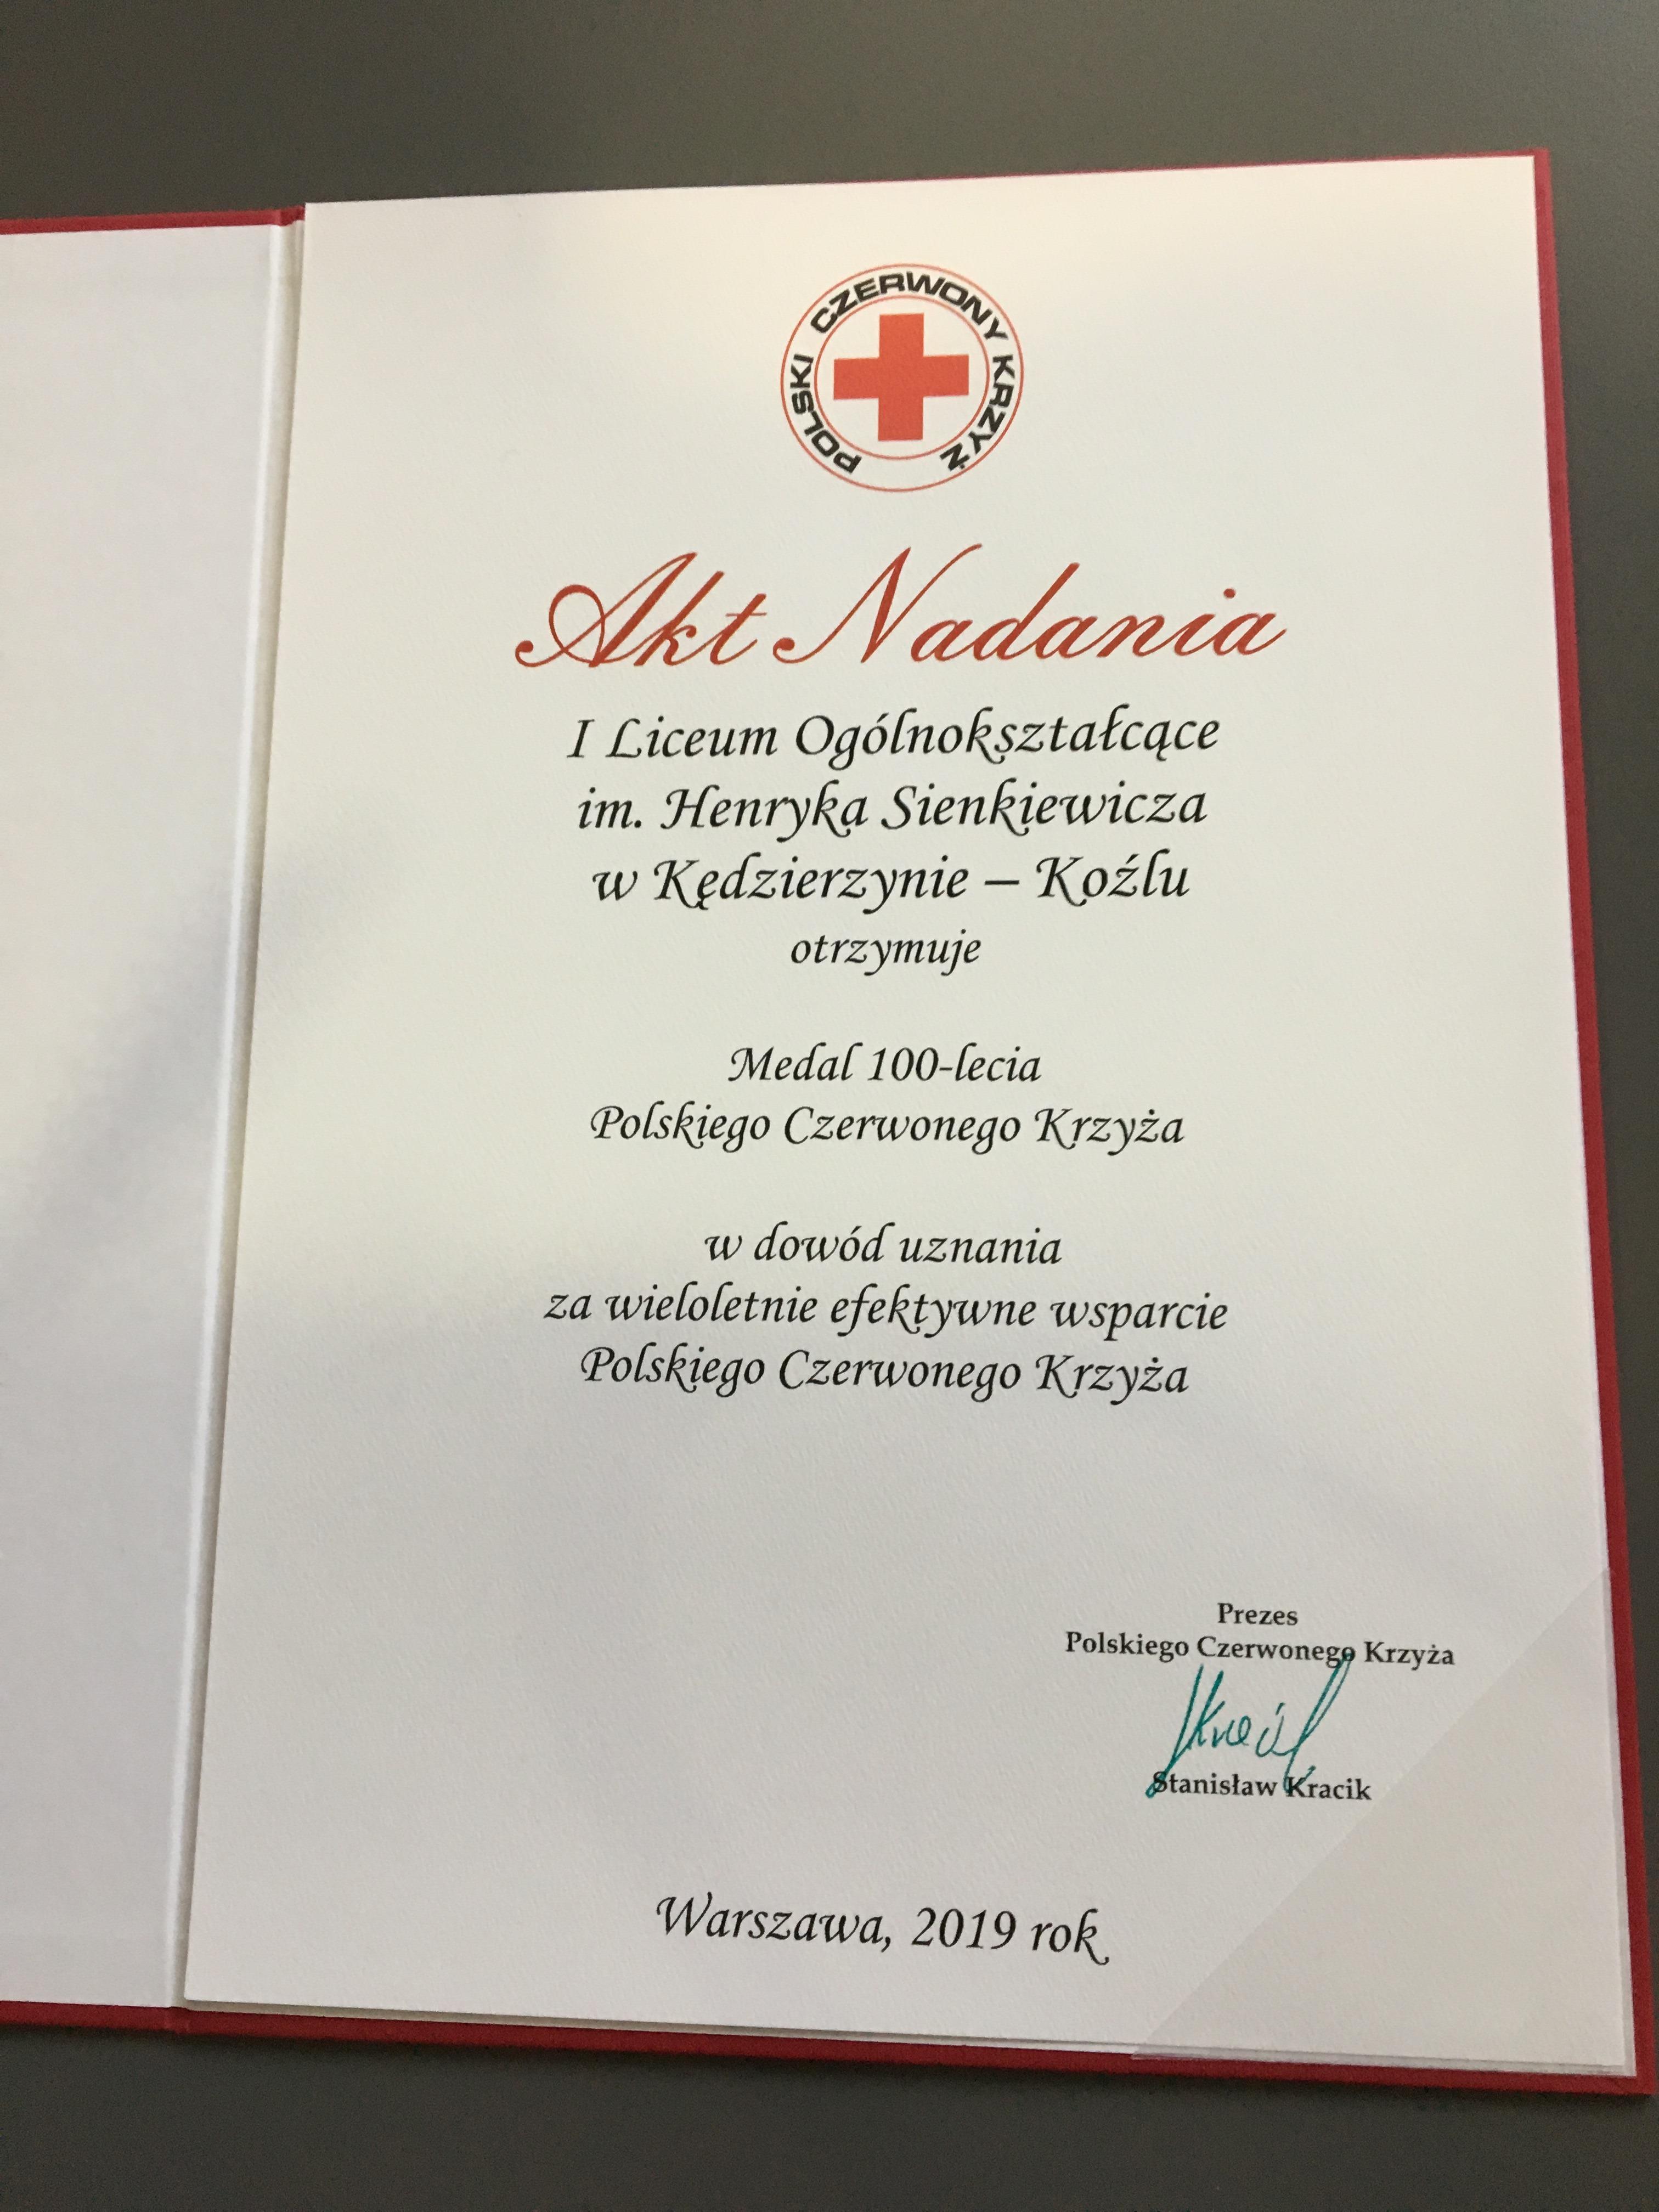 I LO uhonorowane Medalem Stulecia PCK